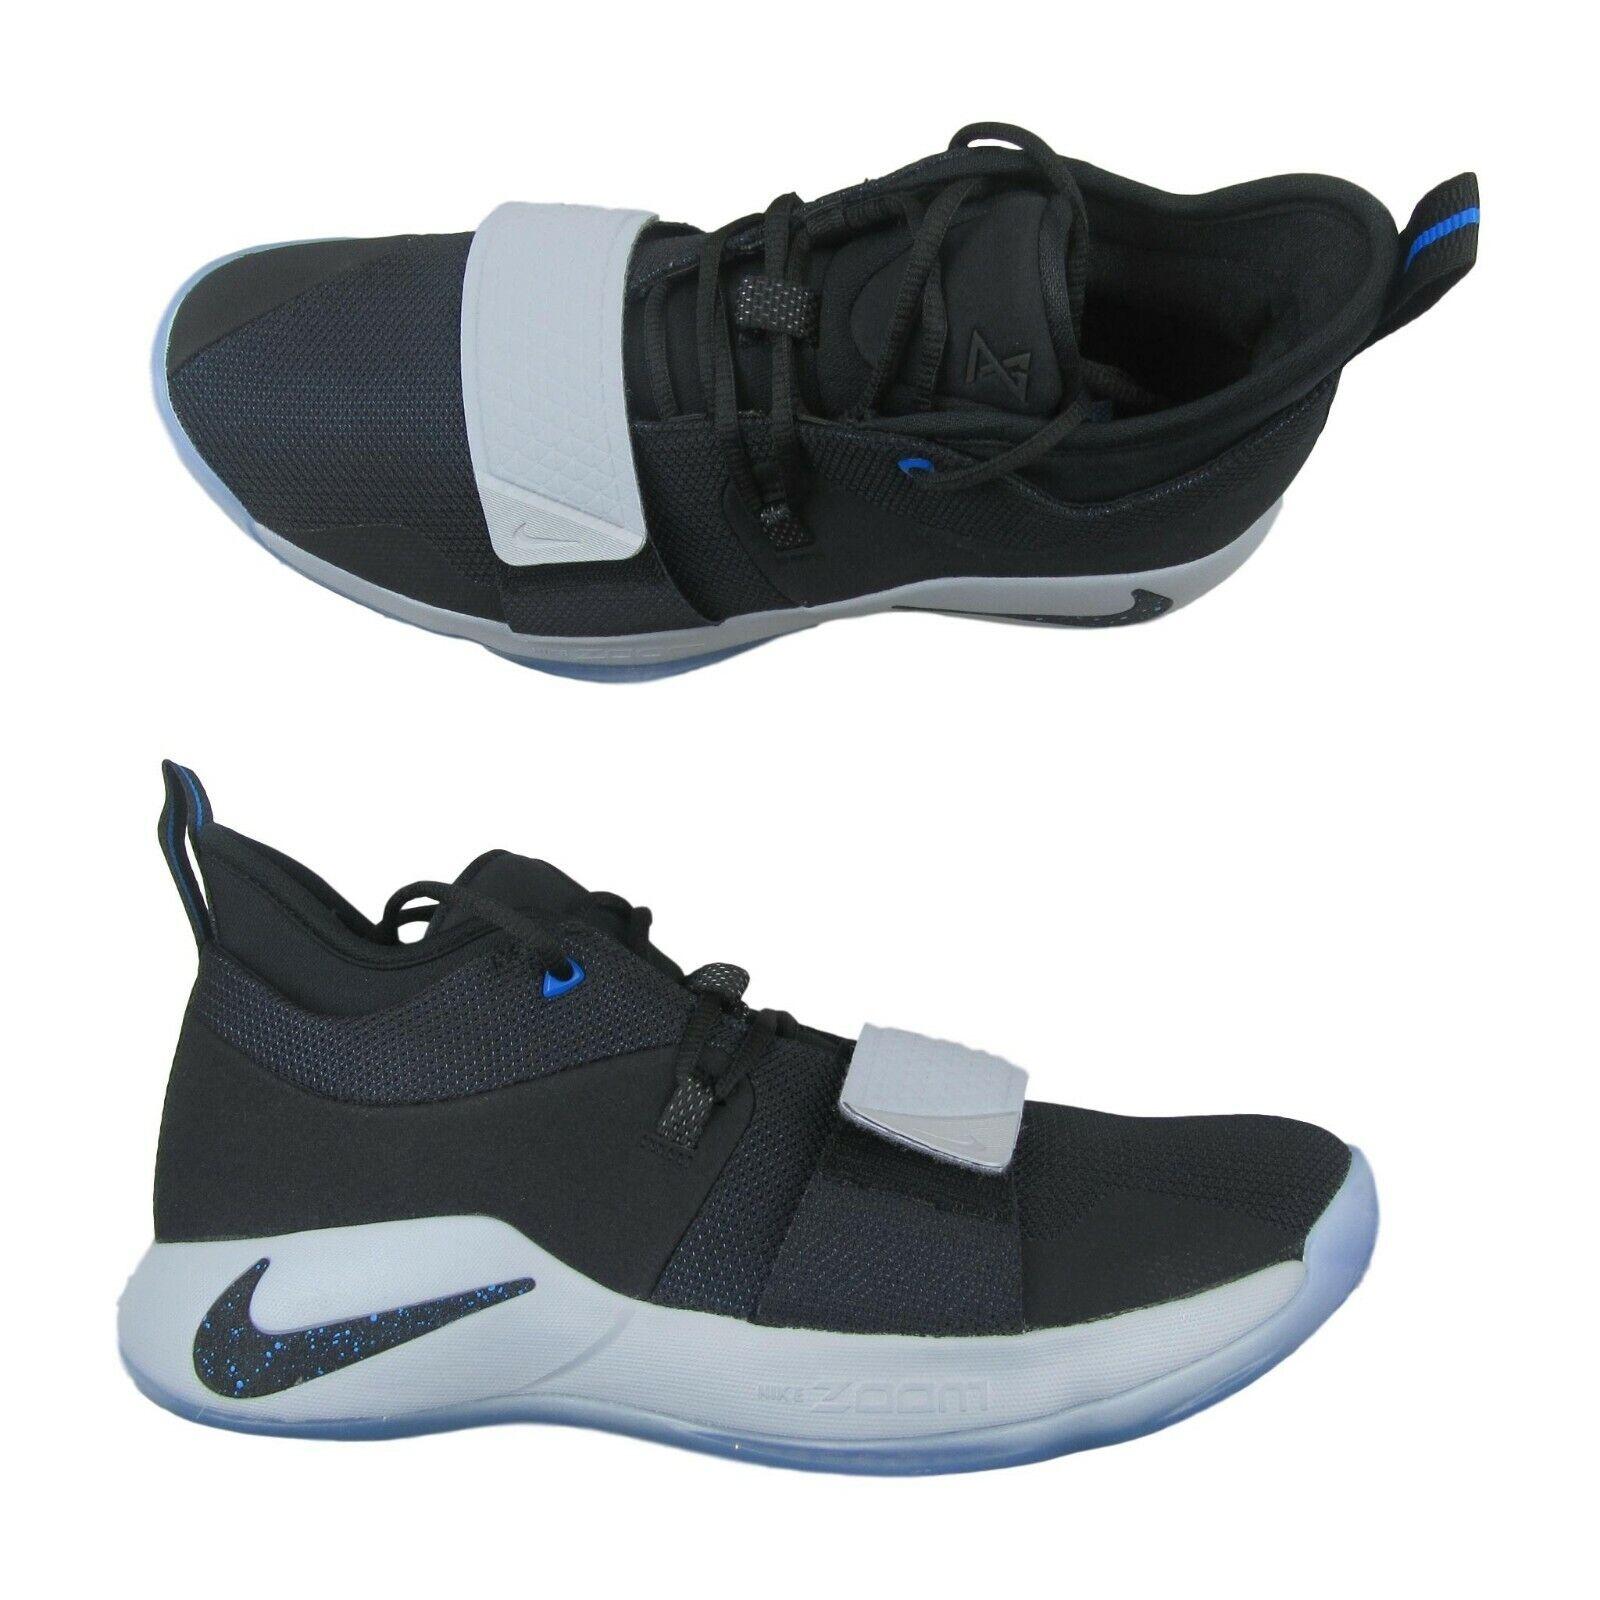 nike pg 2 black foto blu basket scorpe scorpe scorpe 10,5 mens bq8452 006 | Del Nuovo Di Arrivo  | Stile elegante  | Gentiluomo/Signora Scarpa  f8895f